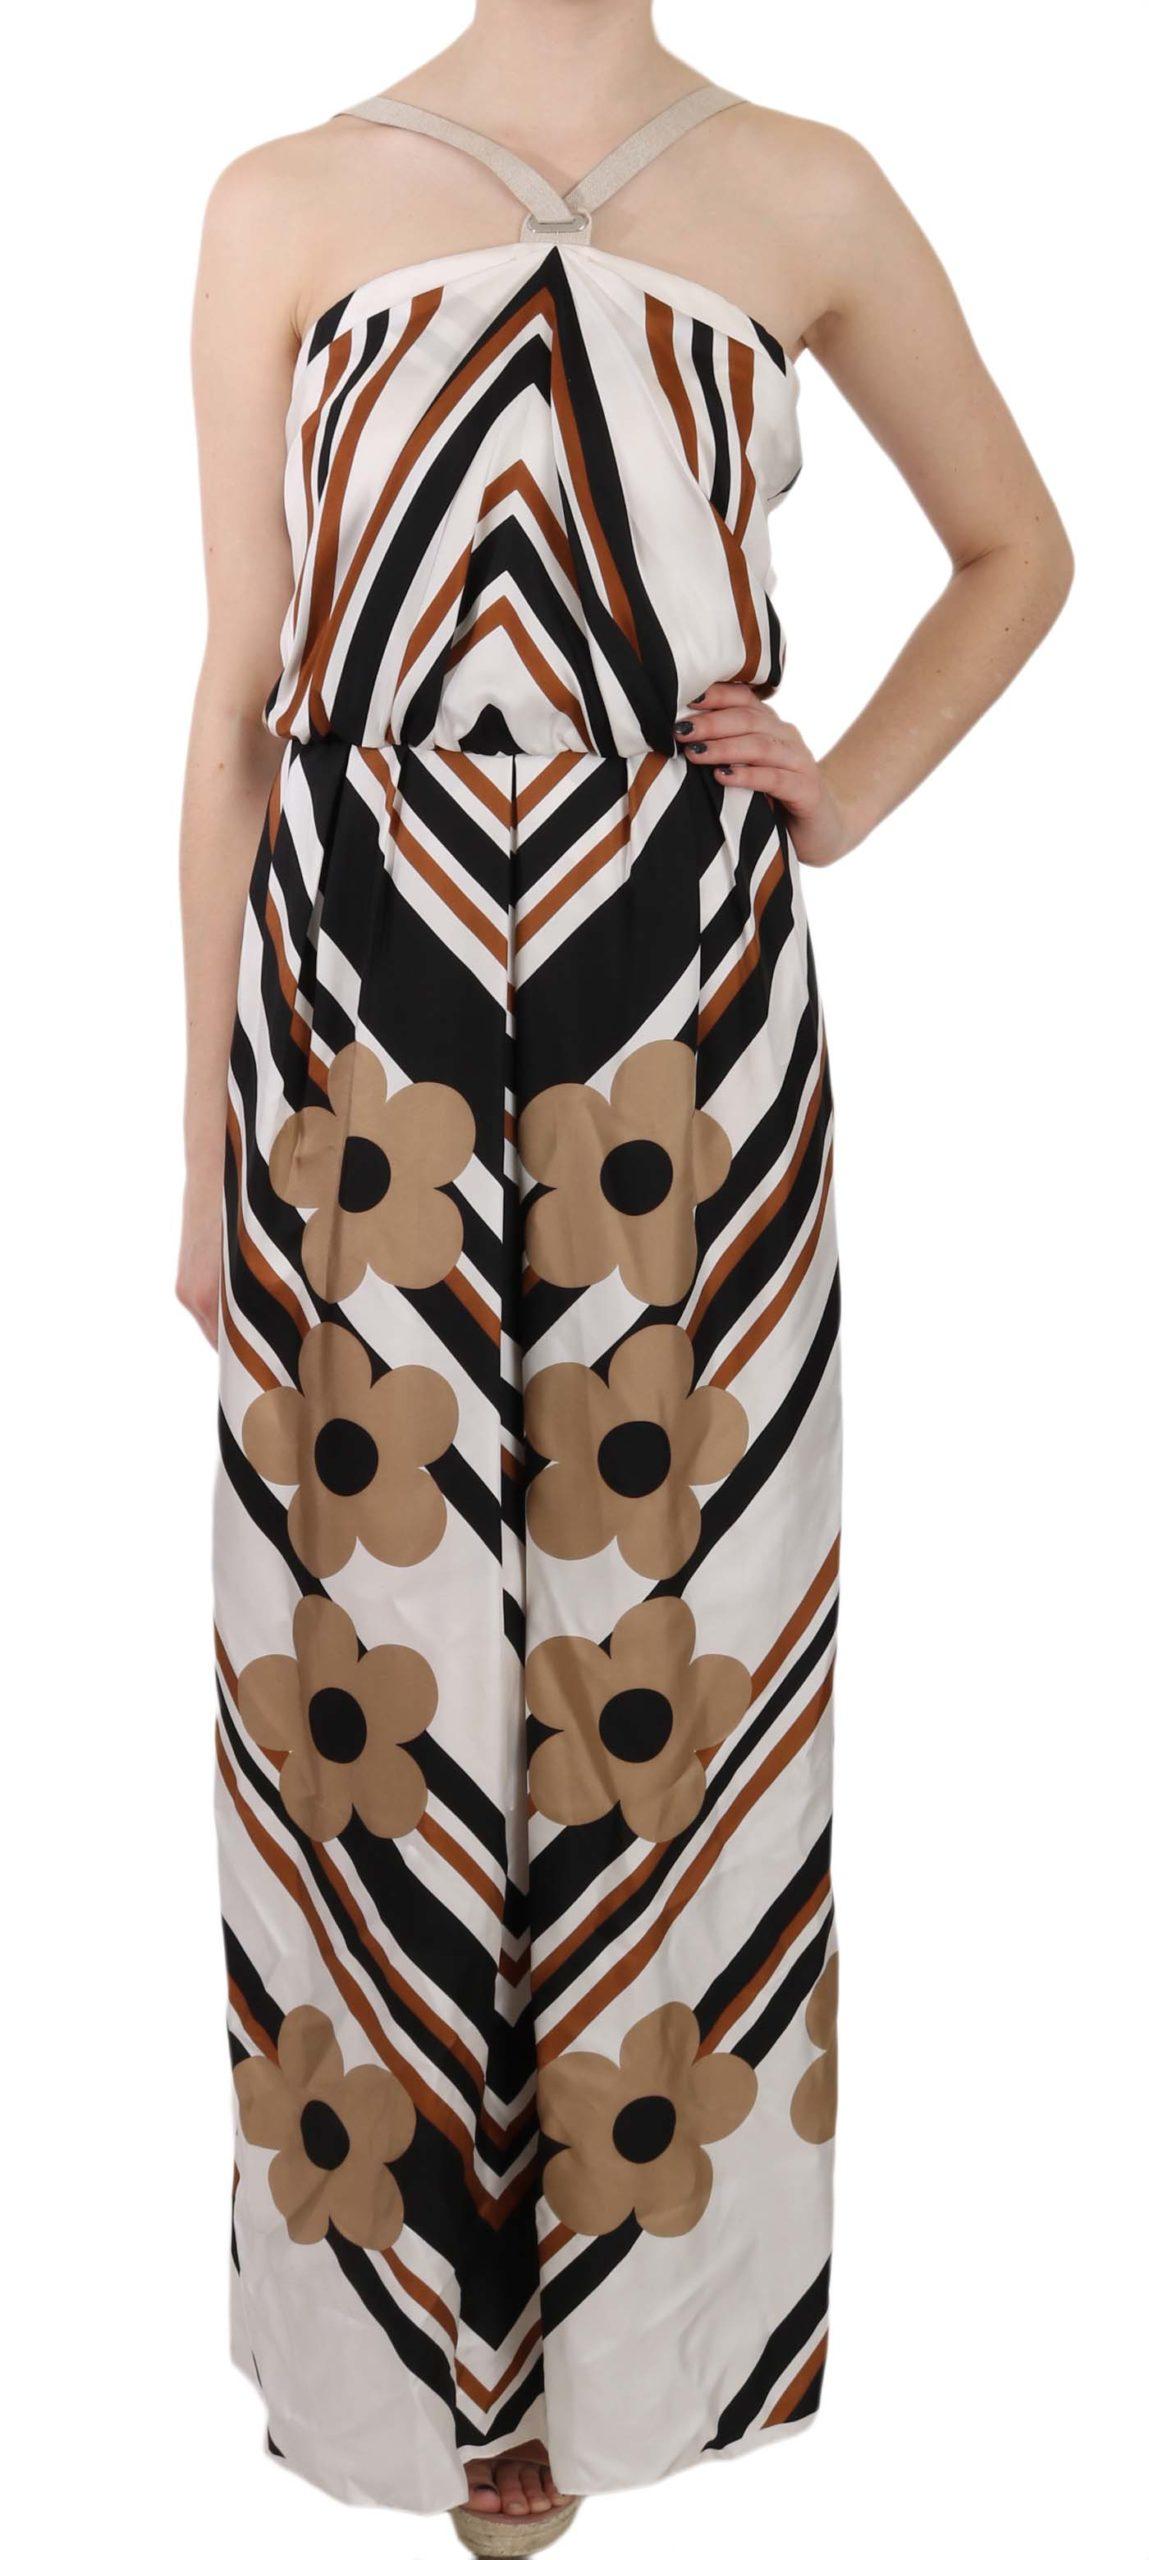 Dolce & Gabbana Women's Striped Silk Gown Dress White DR1686 - IT40 S